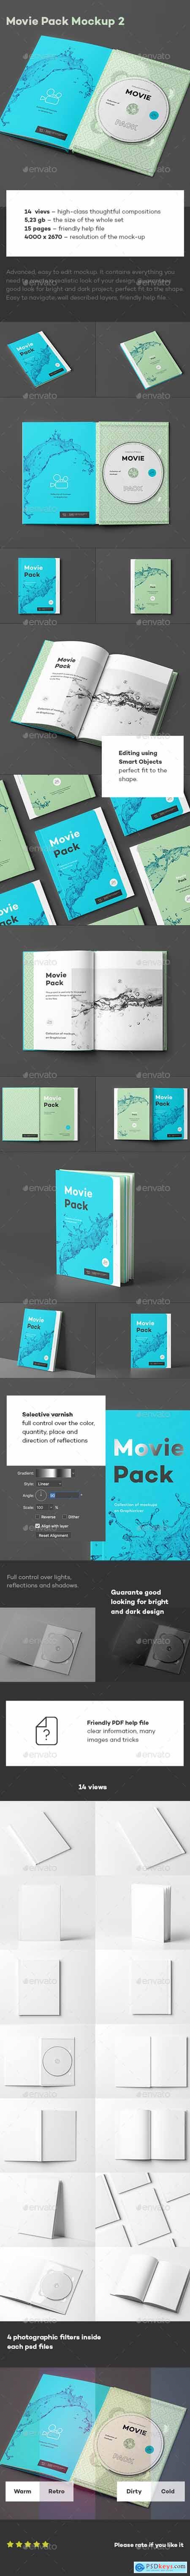 Movie Pack Mock-up 2 24245529